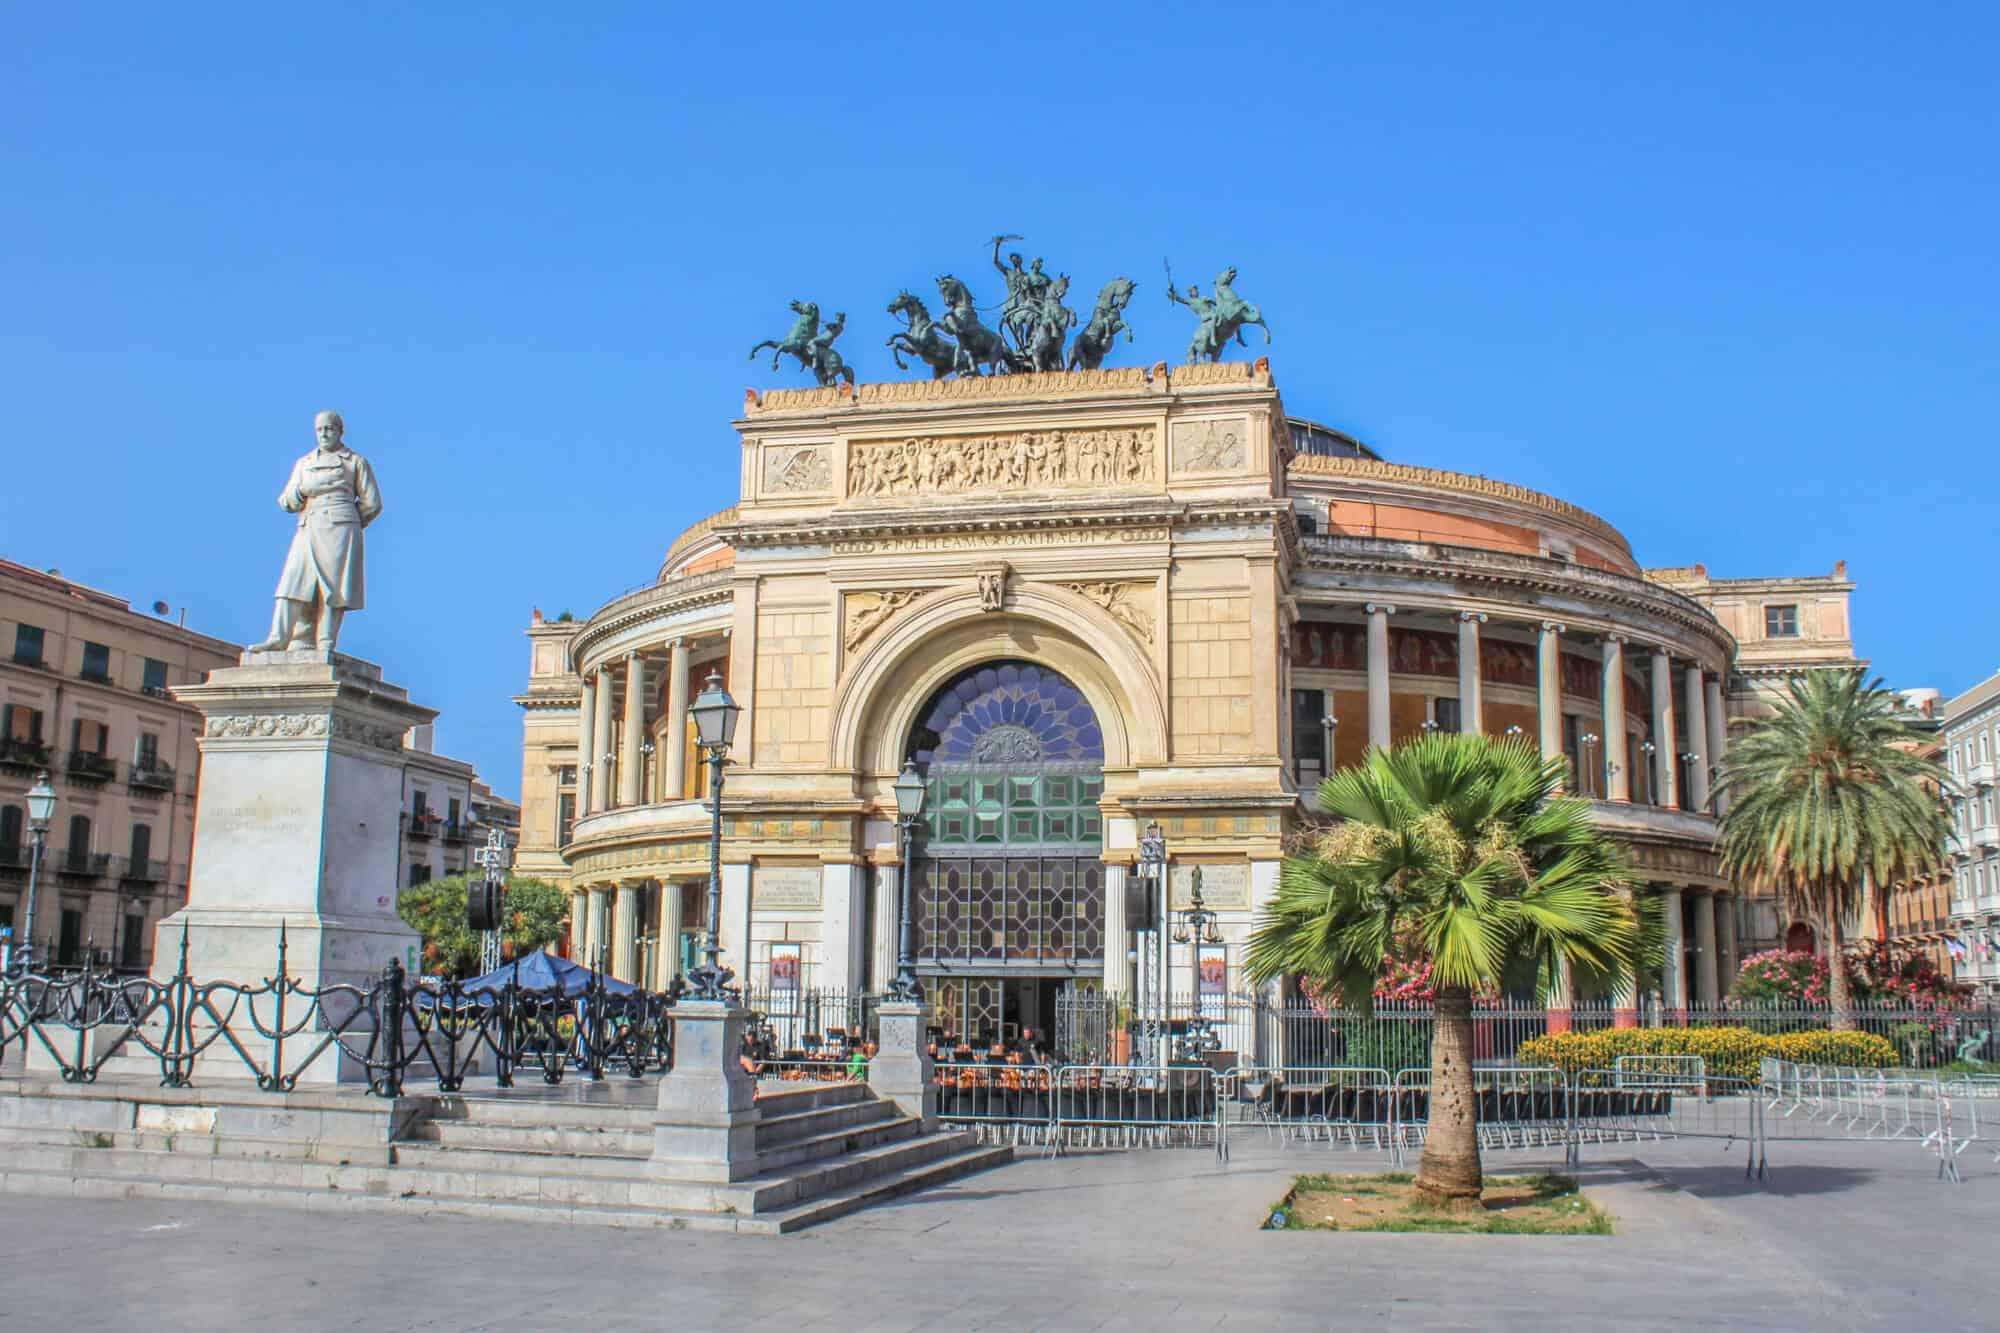 Politeama Palermo